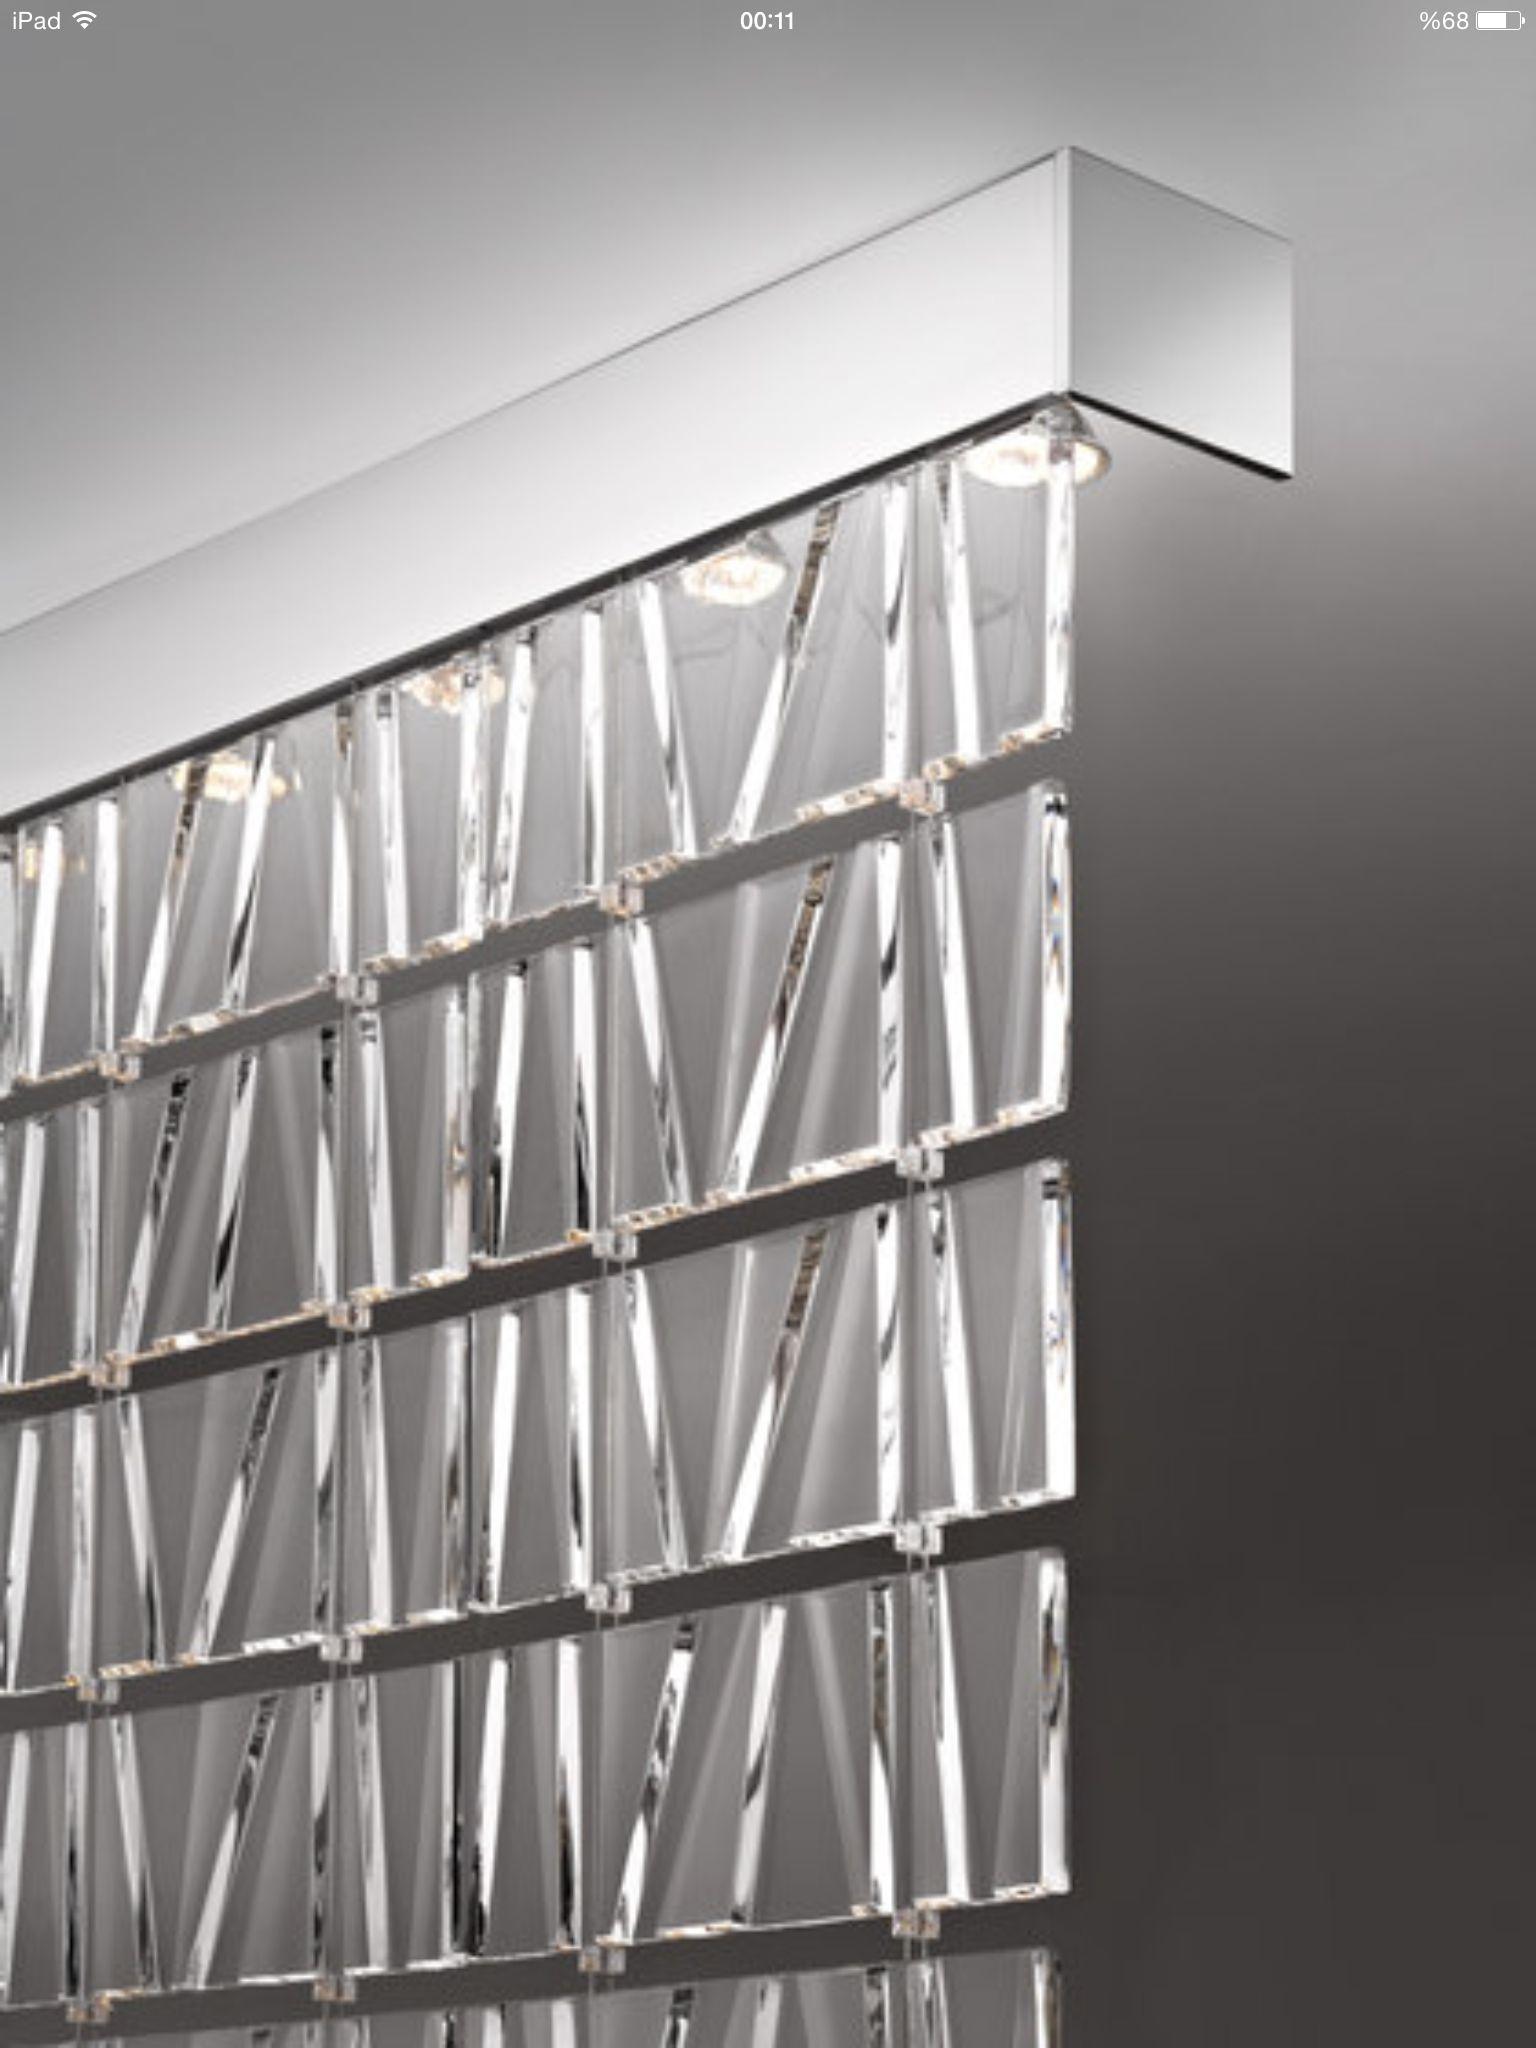 Fabbian illuminazione spa | Lighting Elements | Pinterest | Lights ...